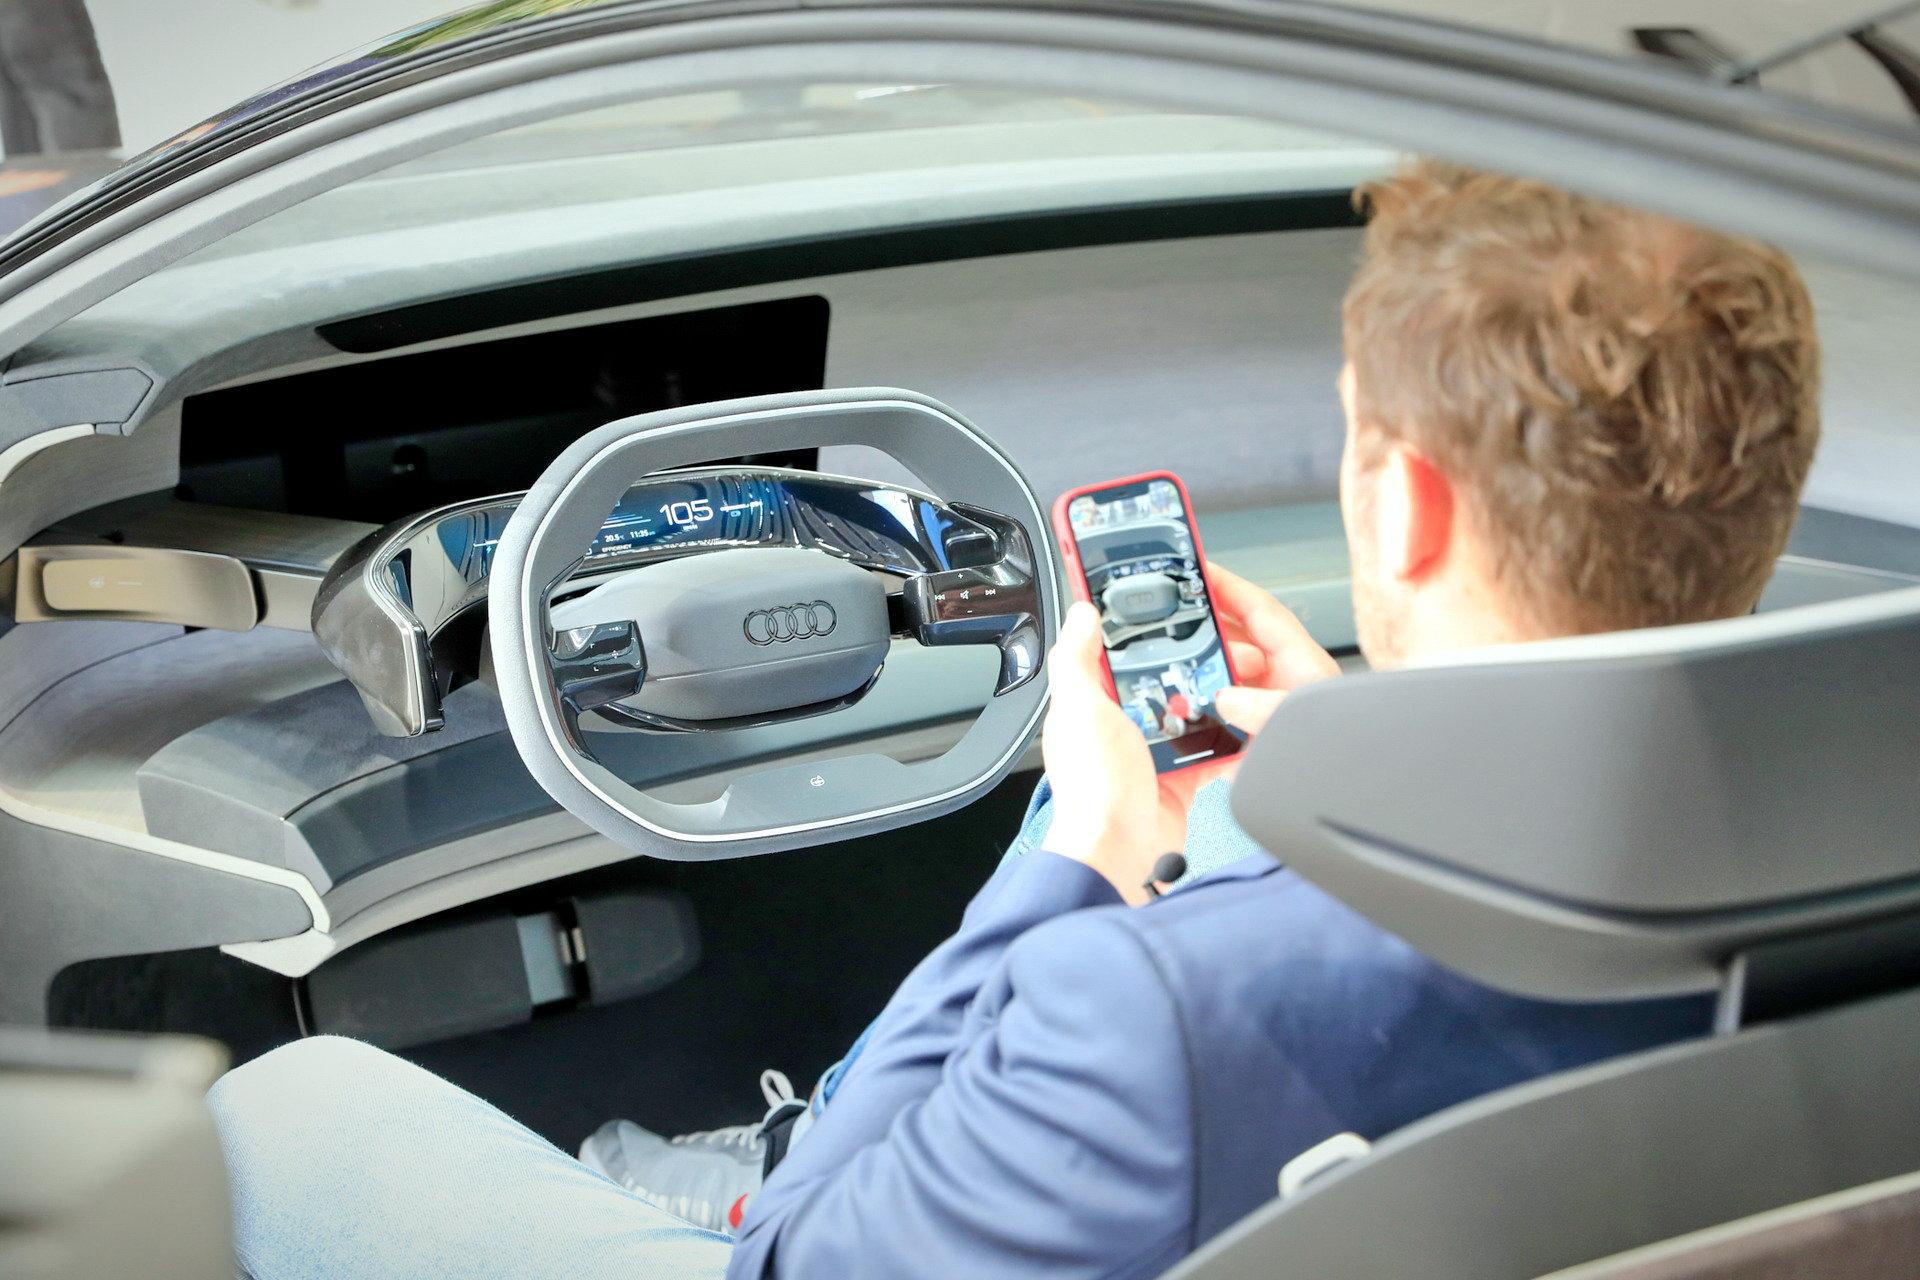 Audi-GrandSphere-Concept-A8-23.jpg